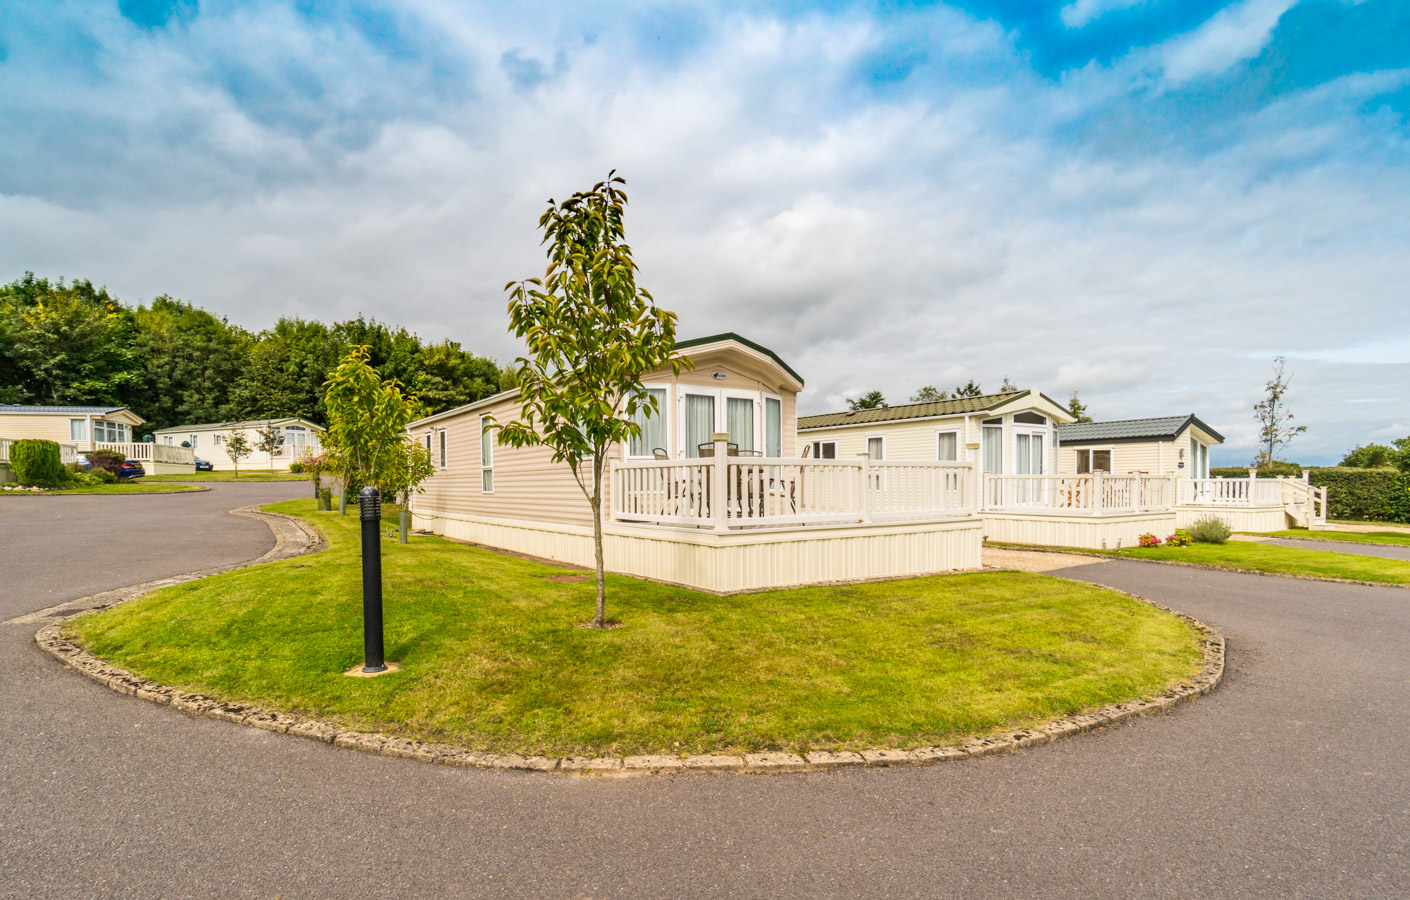 Neil-Bigwood-Monkton-Wyld-Holiday-Homes-40